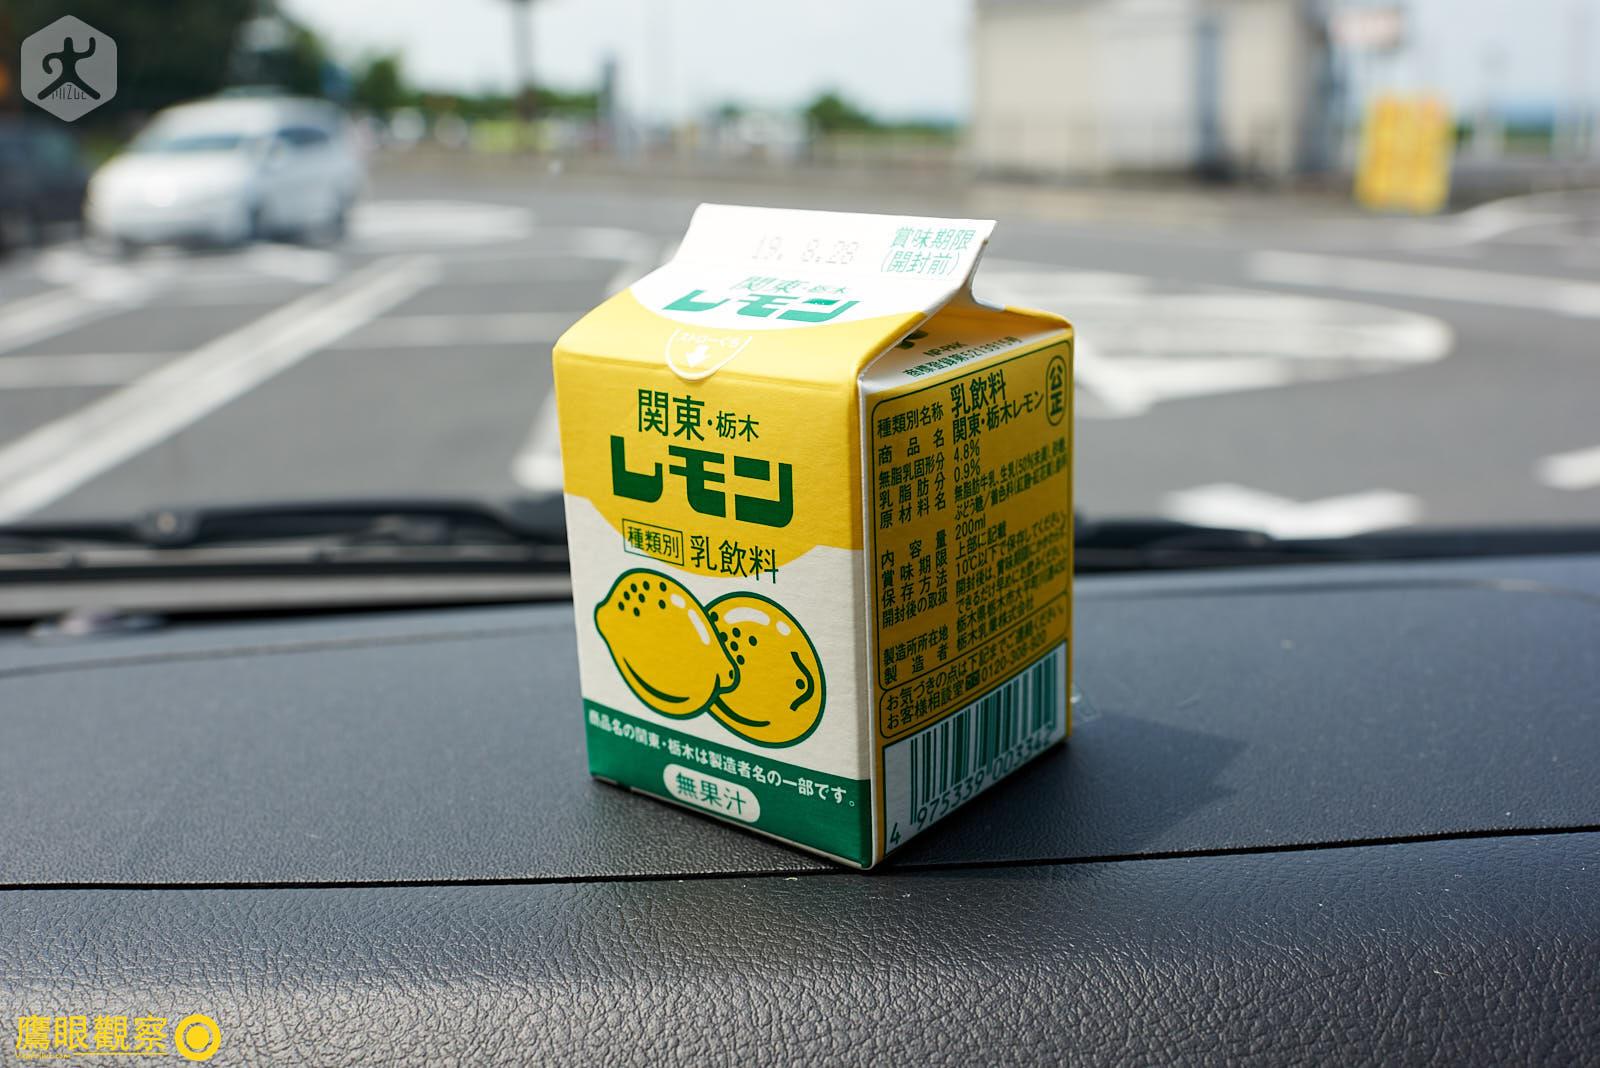 Japan Travel RV Camper back Tokyo 20190818111602 日本廢棄小學 🚗 RV 休旅車露營、森林探險之旅(櫪木縣鹿沼市立久我小學)🇯🇵⛺️